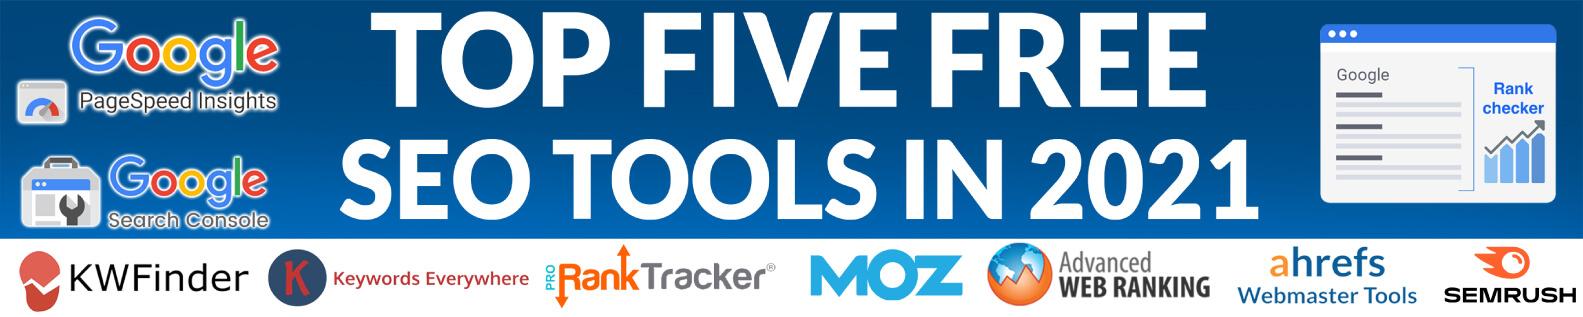 Top Five Free SEO Tools in 2021